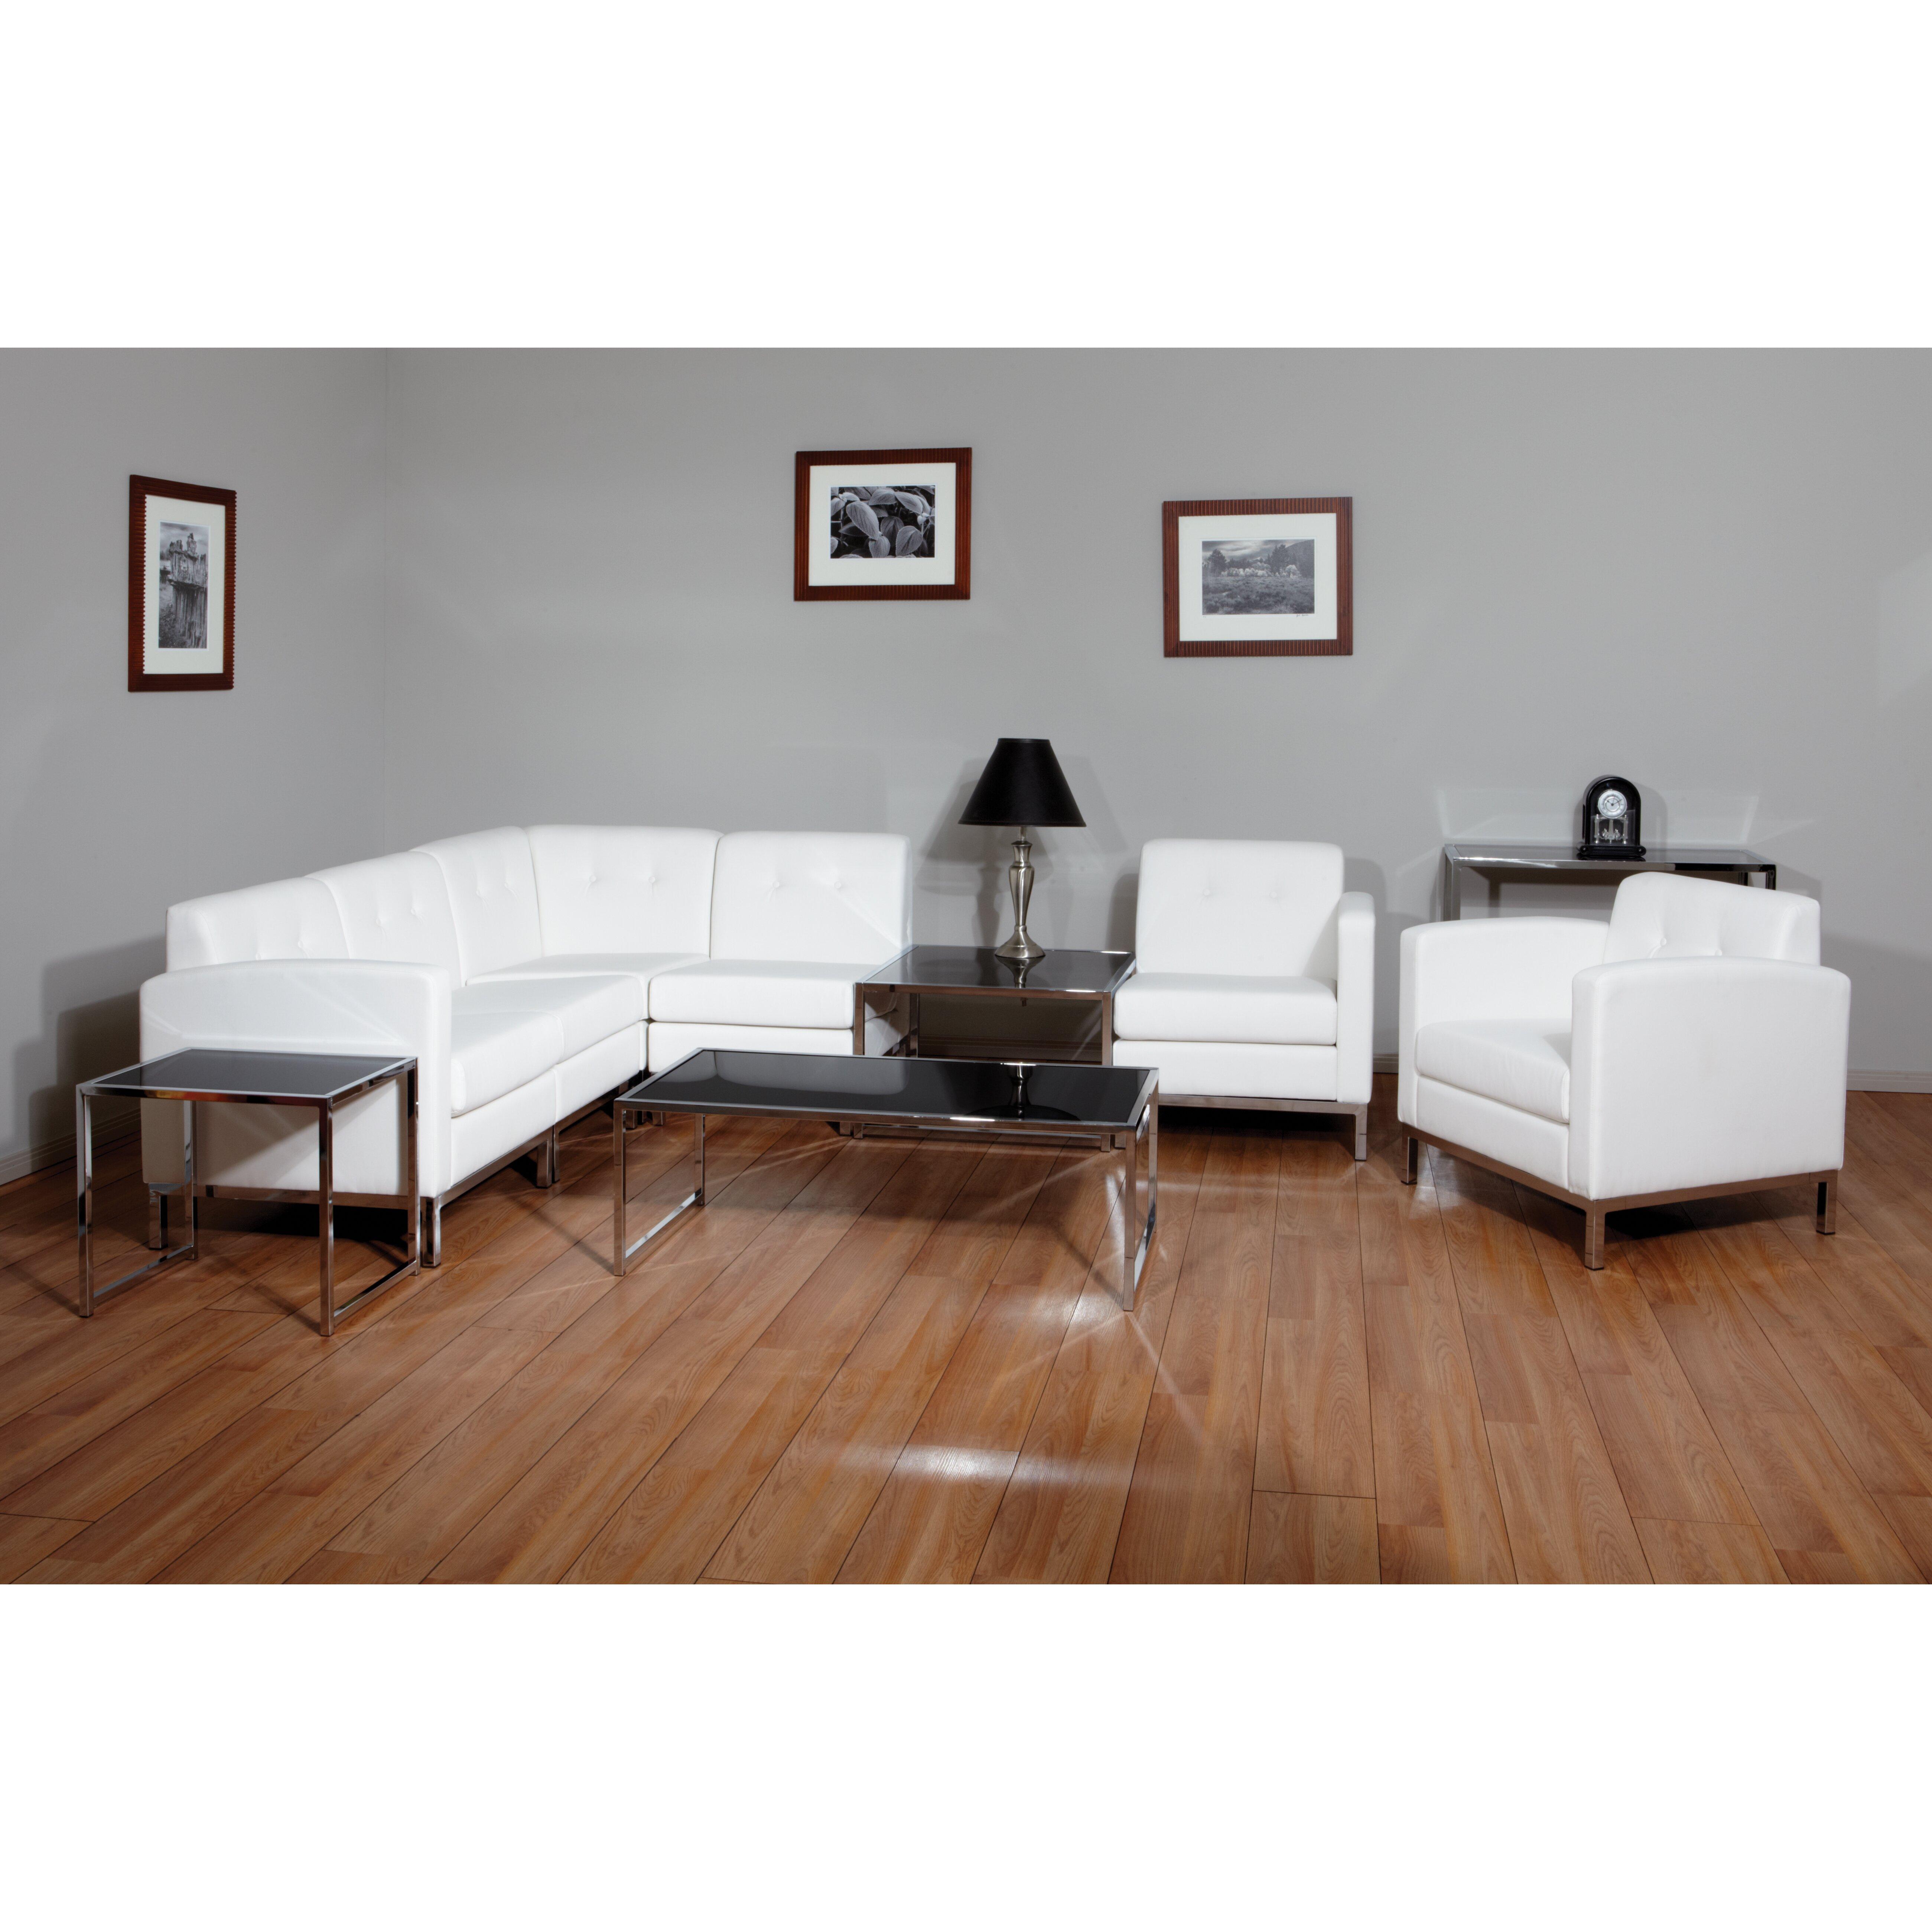 Living Room Arm Chairs Bay Isle Home Sargentville 3 Pieces Living Room Arm Chair Set